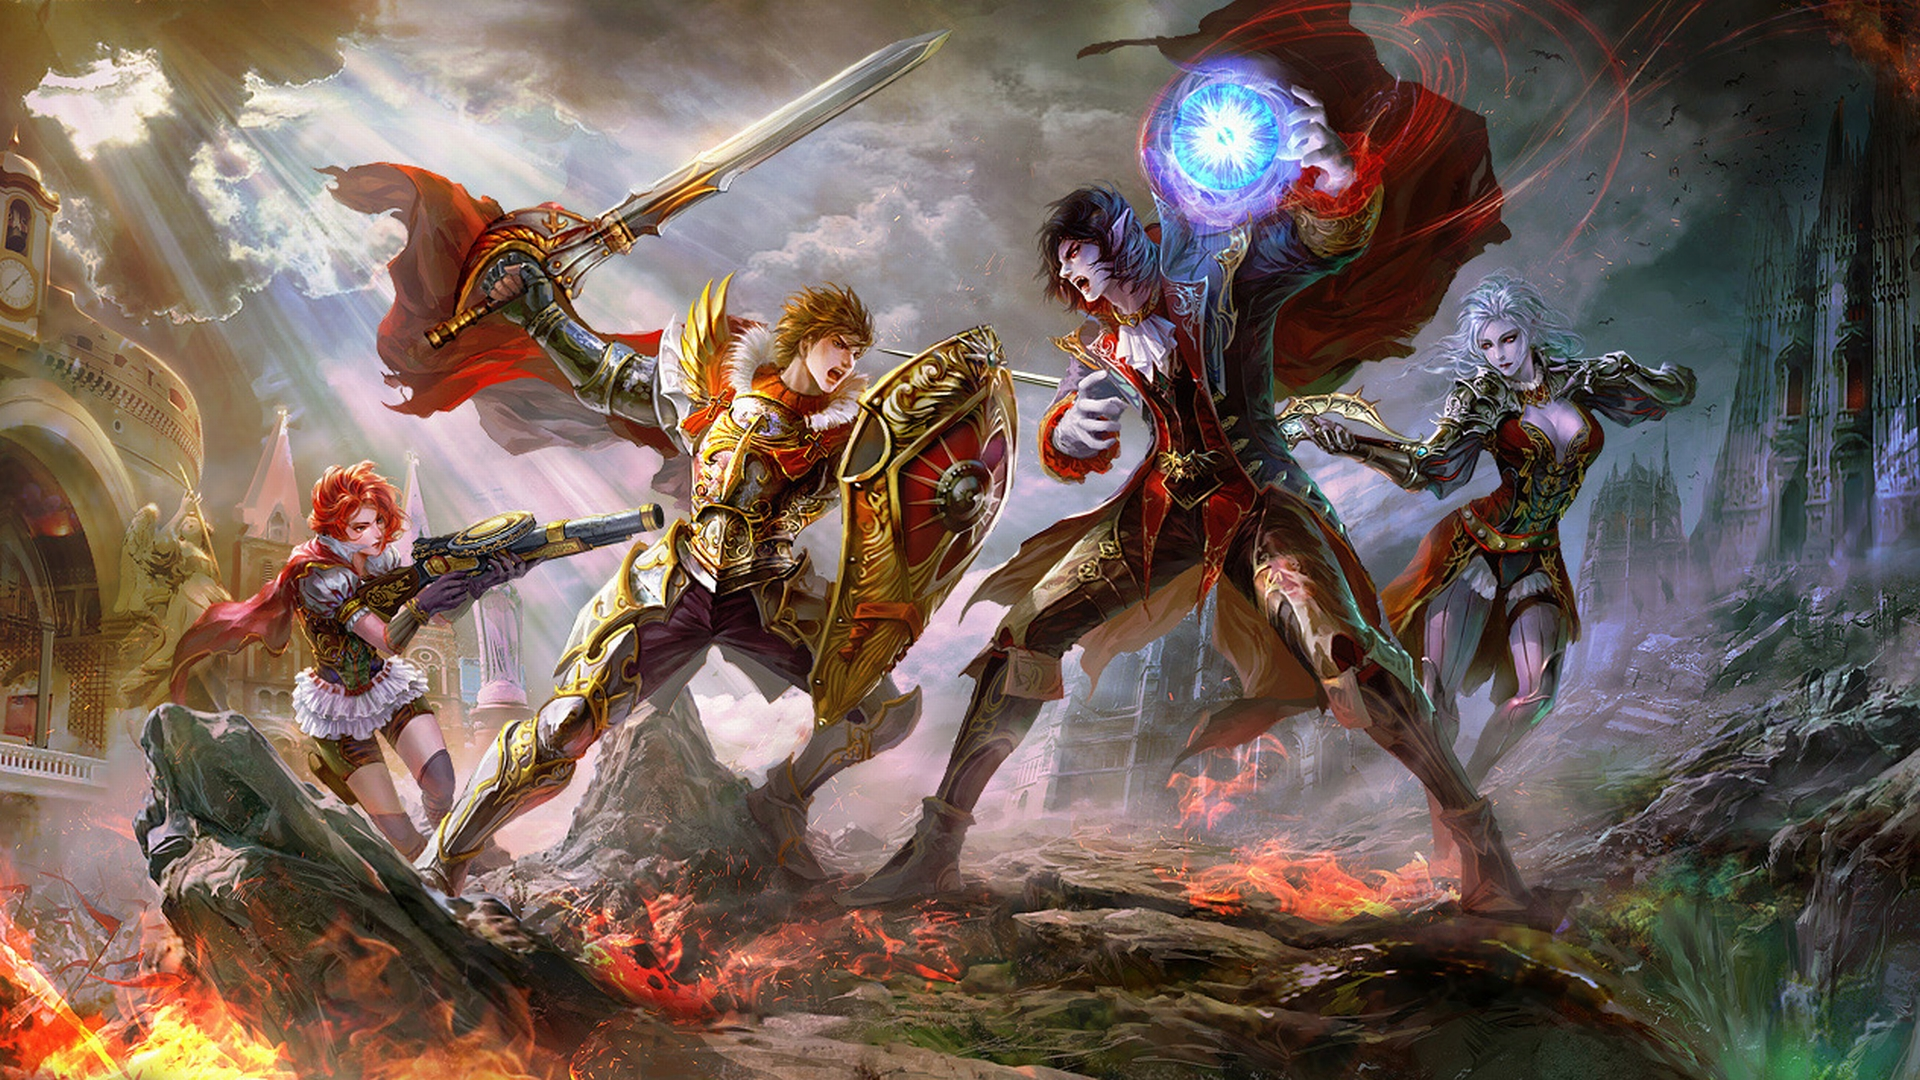 Fantasía - Batalla  Supernatural Espada Weapon Mágico Fondo de Pantalla